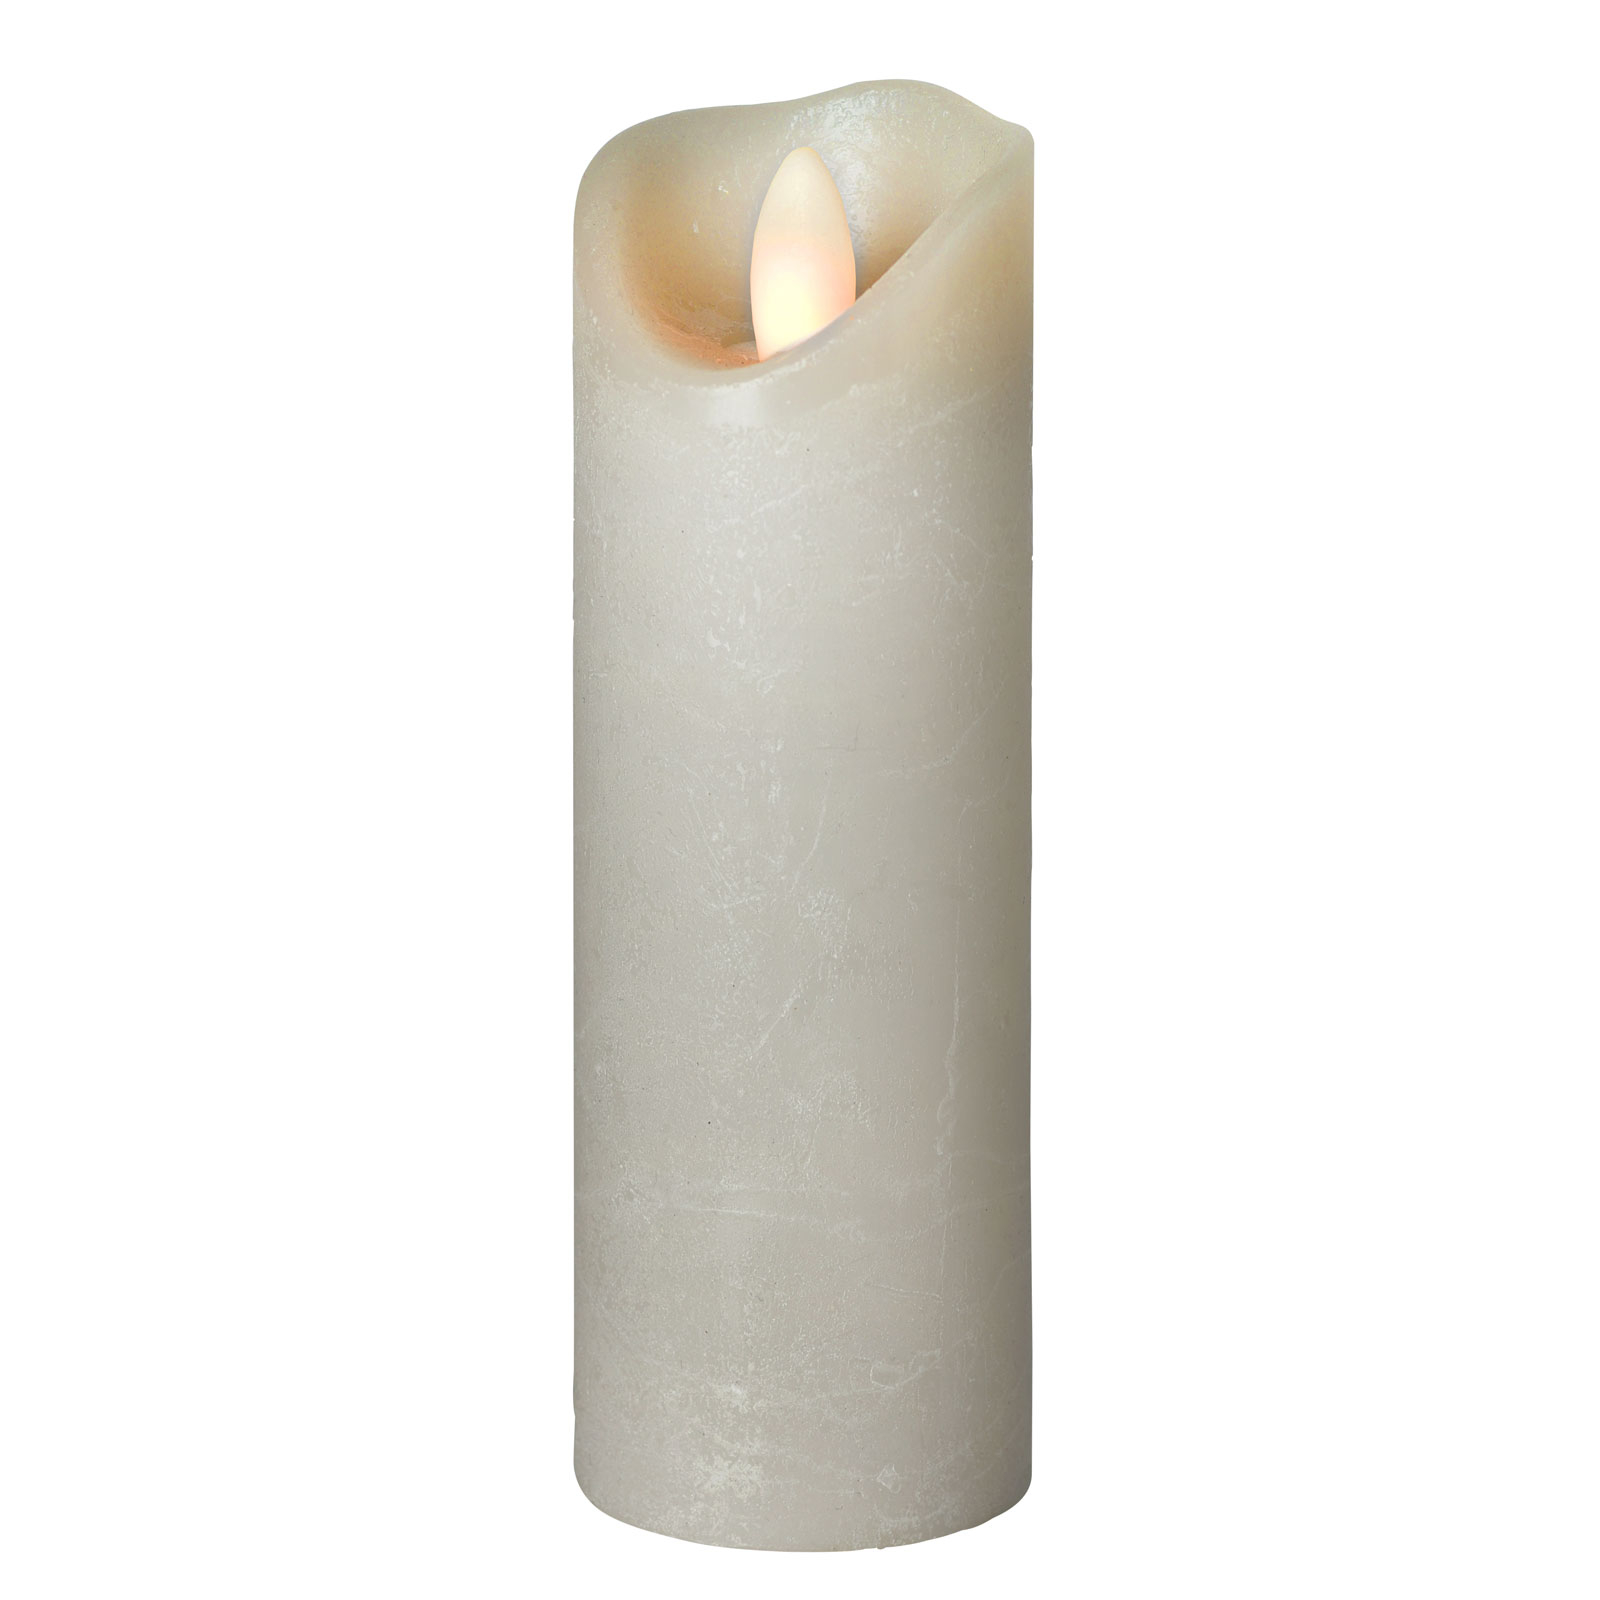 LED-Kerze Shine, Ø 5 cm, grau, Höhe 17,5 cm